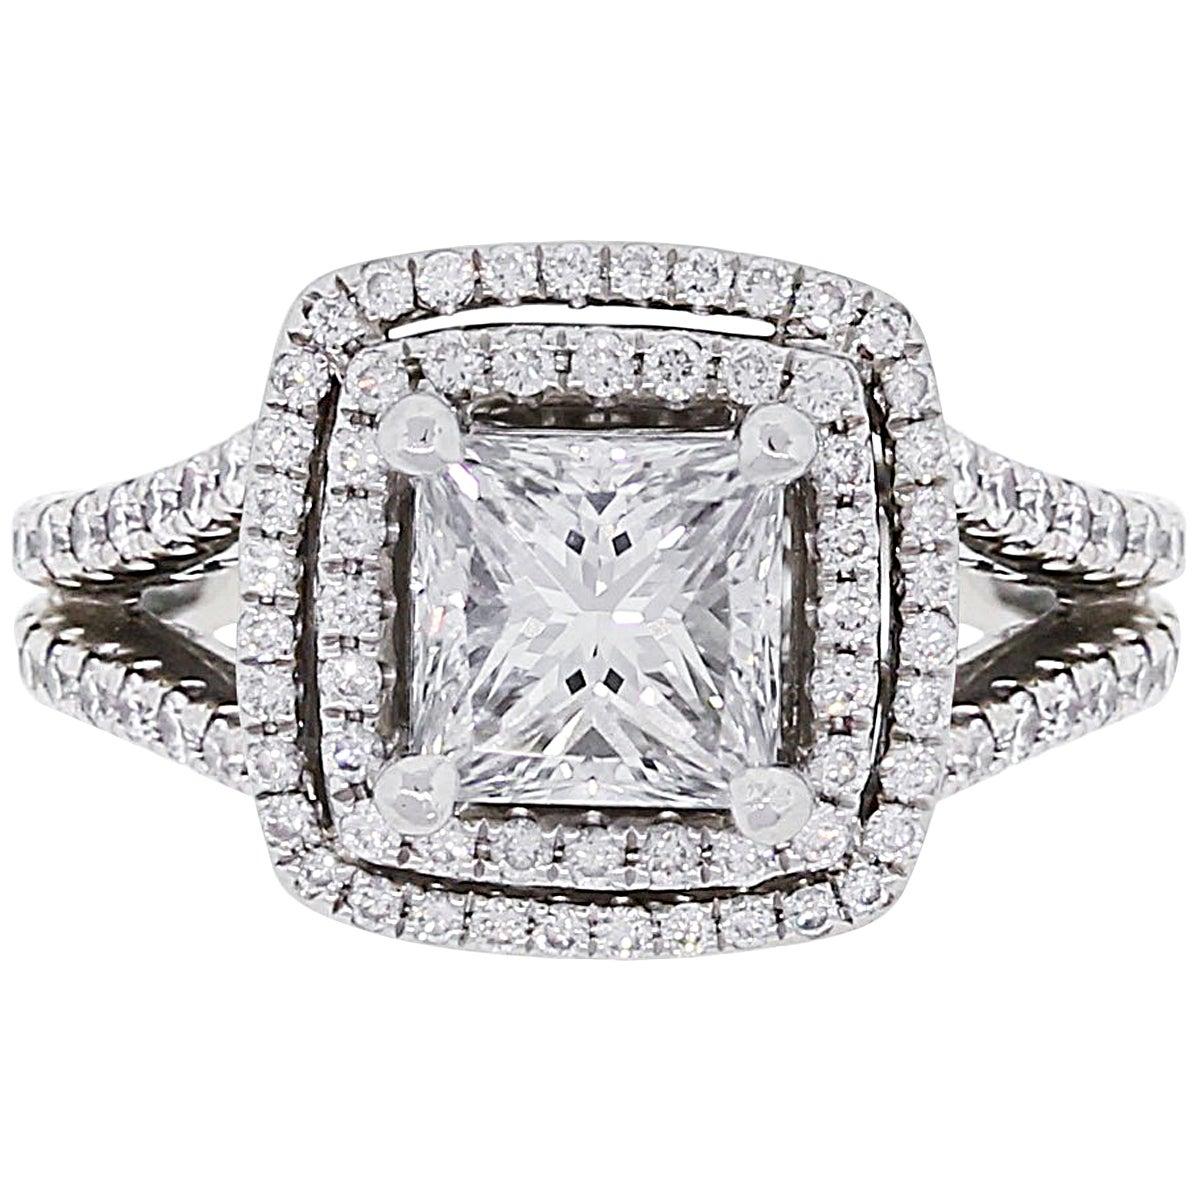 GIA Certified 1.57 Carat Princess Cut Diamond Double Halo Engagement Ring